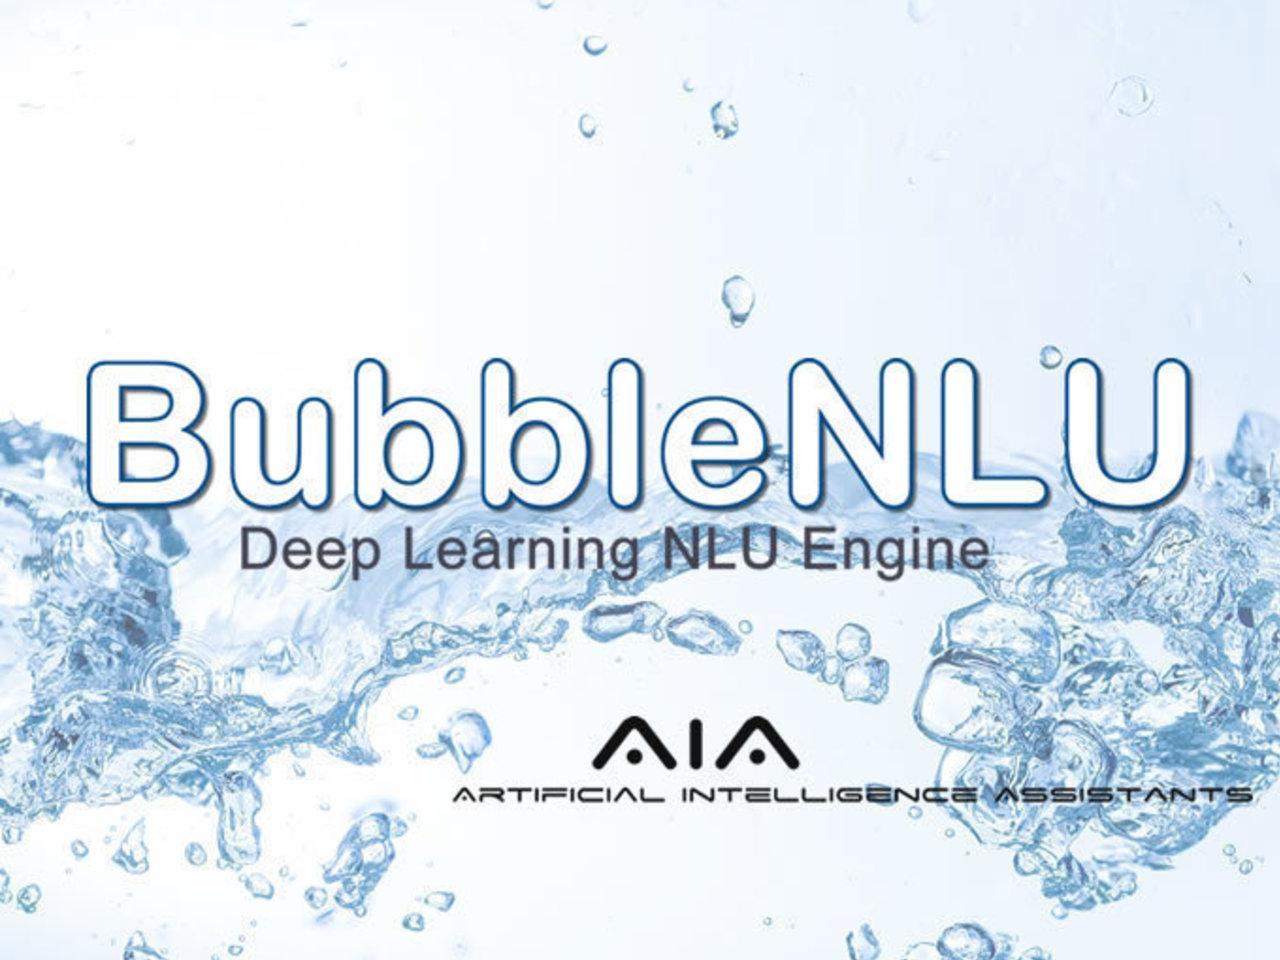 BubbleNLU Deep Learning NLU Engine